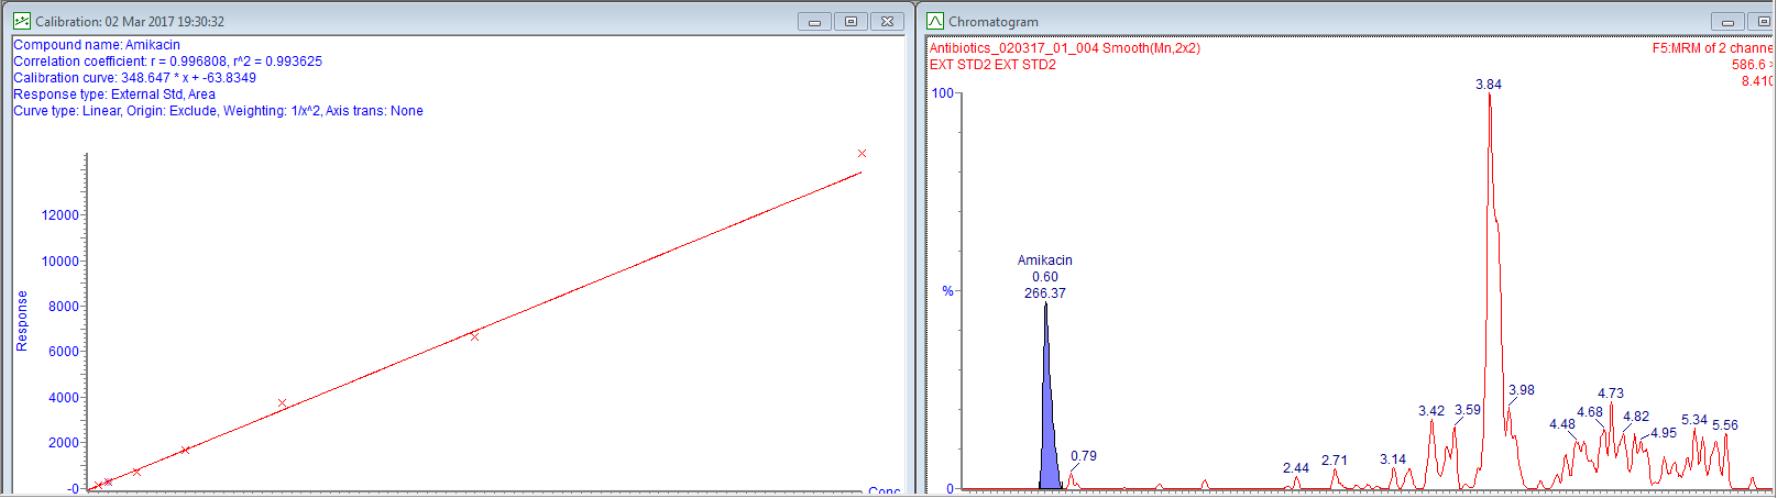 Linearity of AMIKACIN between 1 - 160 ng/mL and chromatogram of AMIKACIN